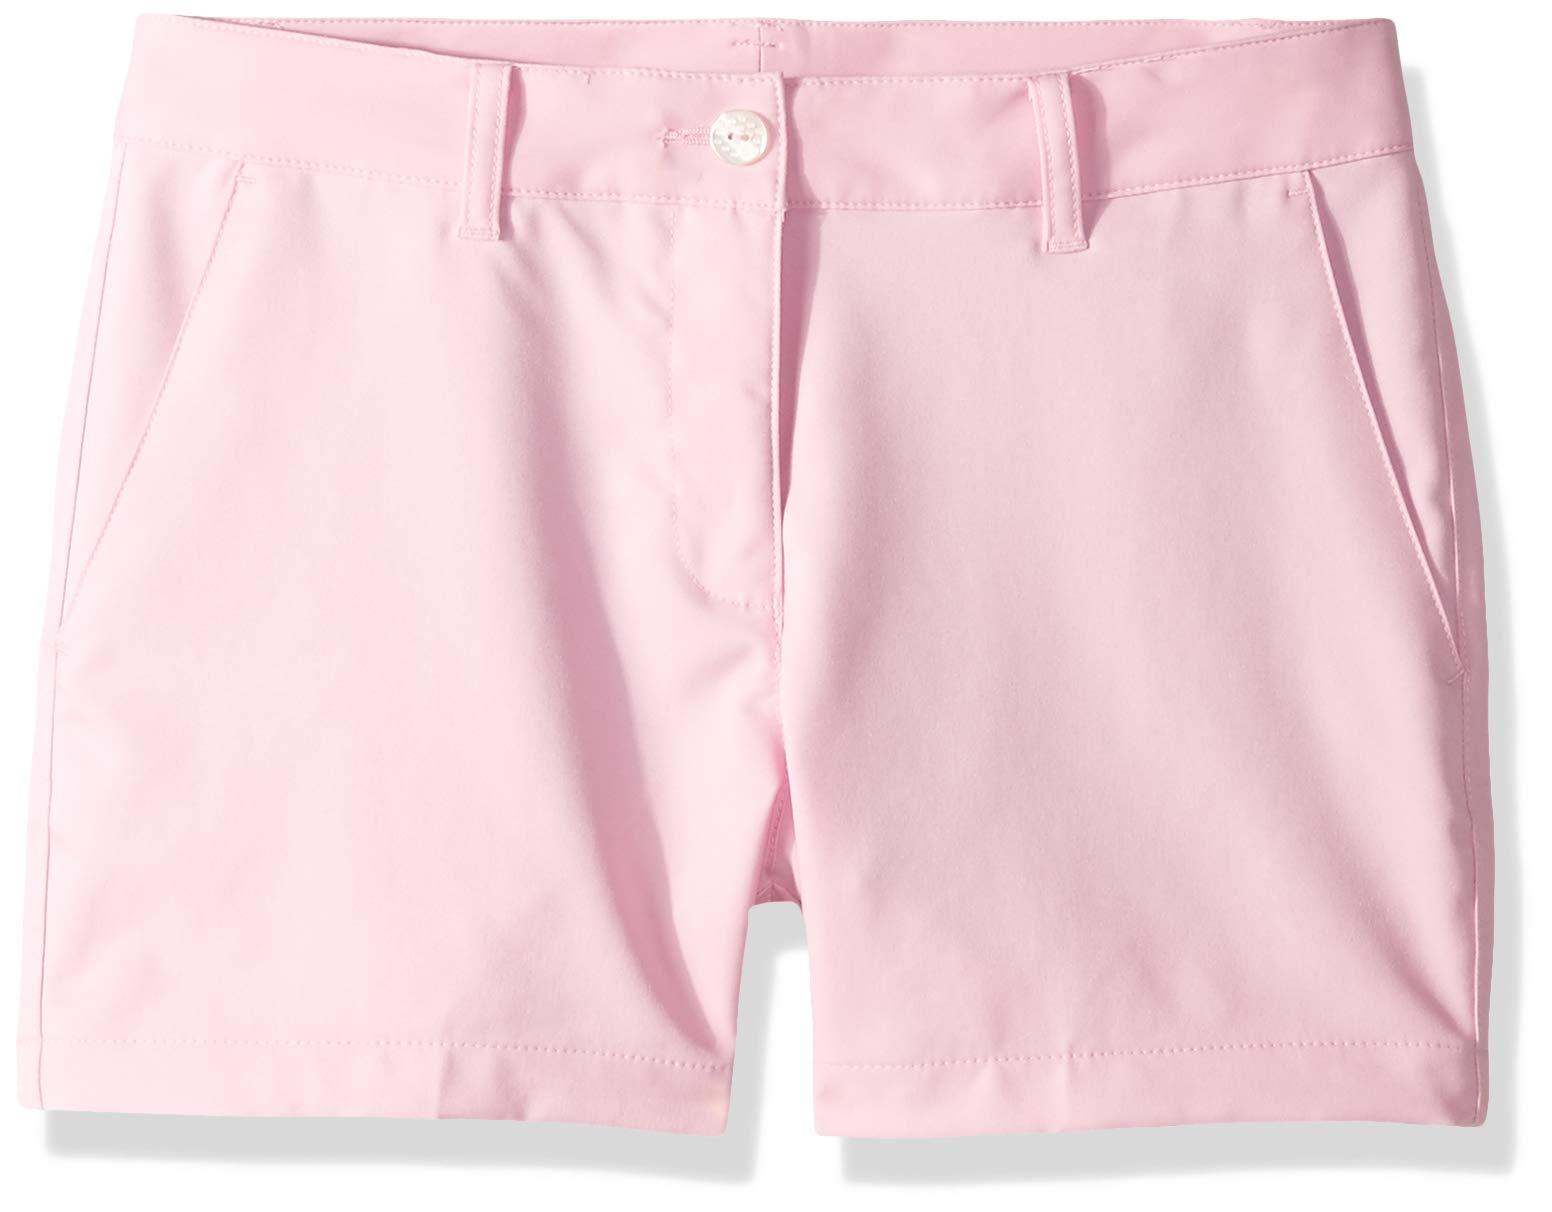 Puma Golf Girls 2019 Short, Pale Pink, x Large by PUMA